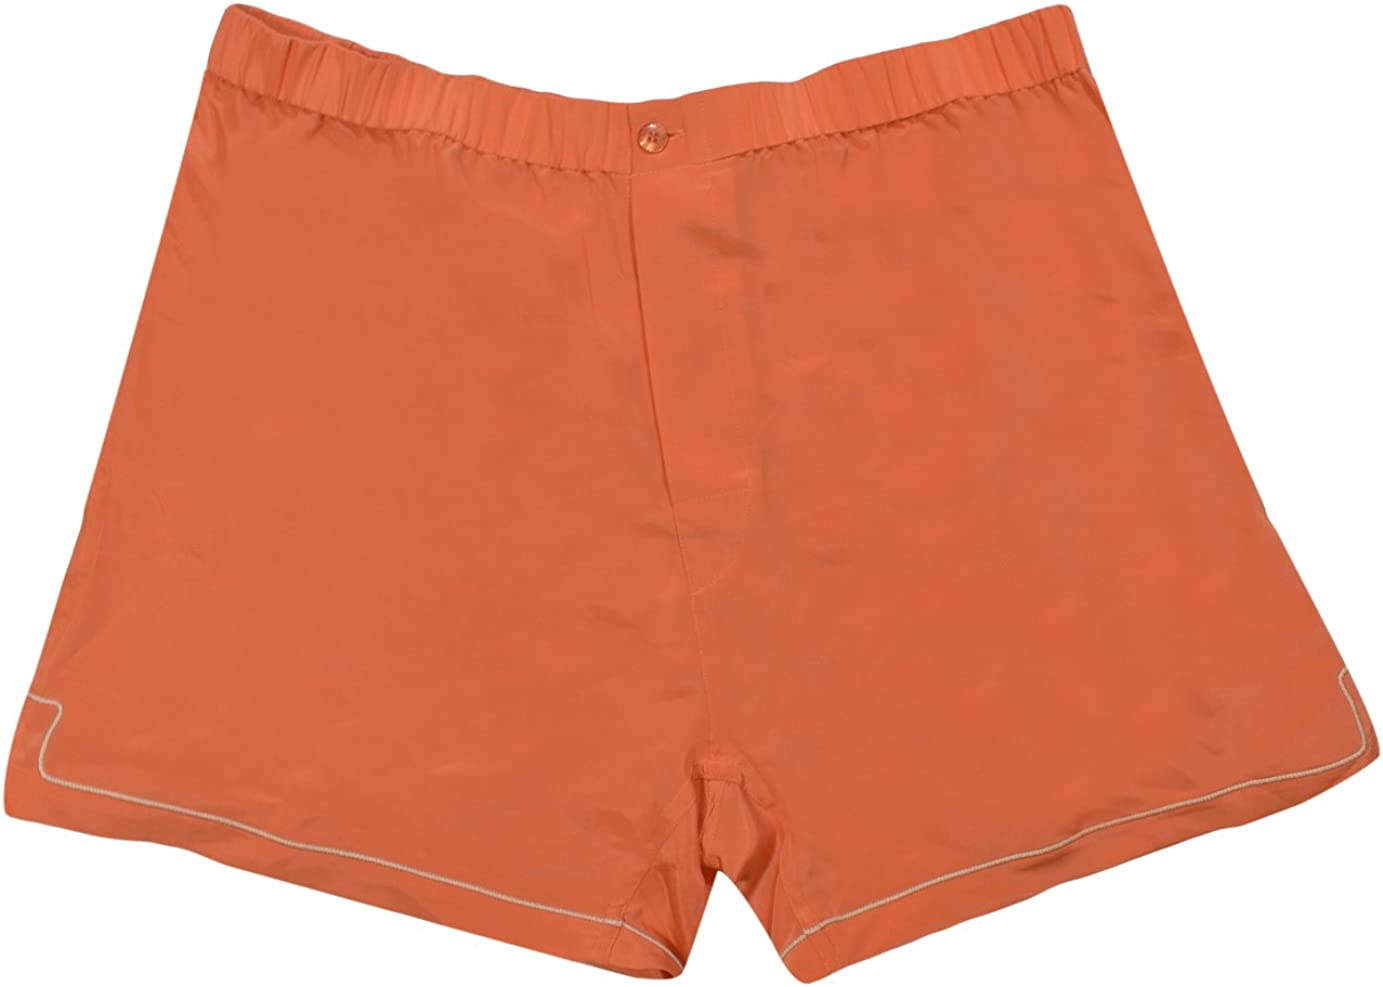 Nero Perla Orange 100/% Silk Boxer